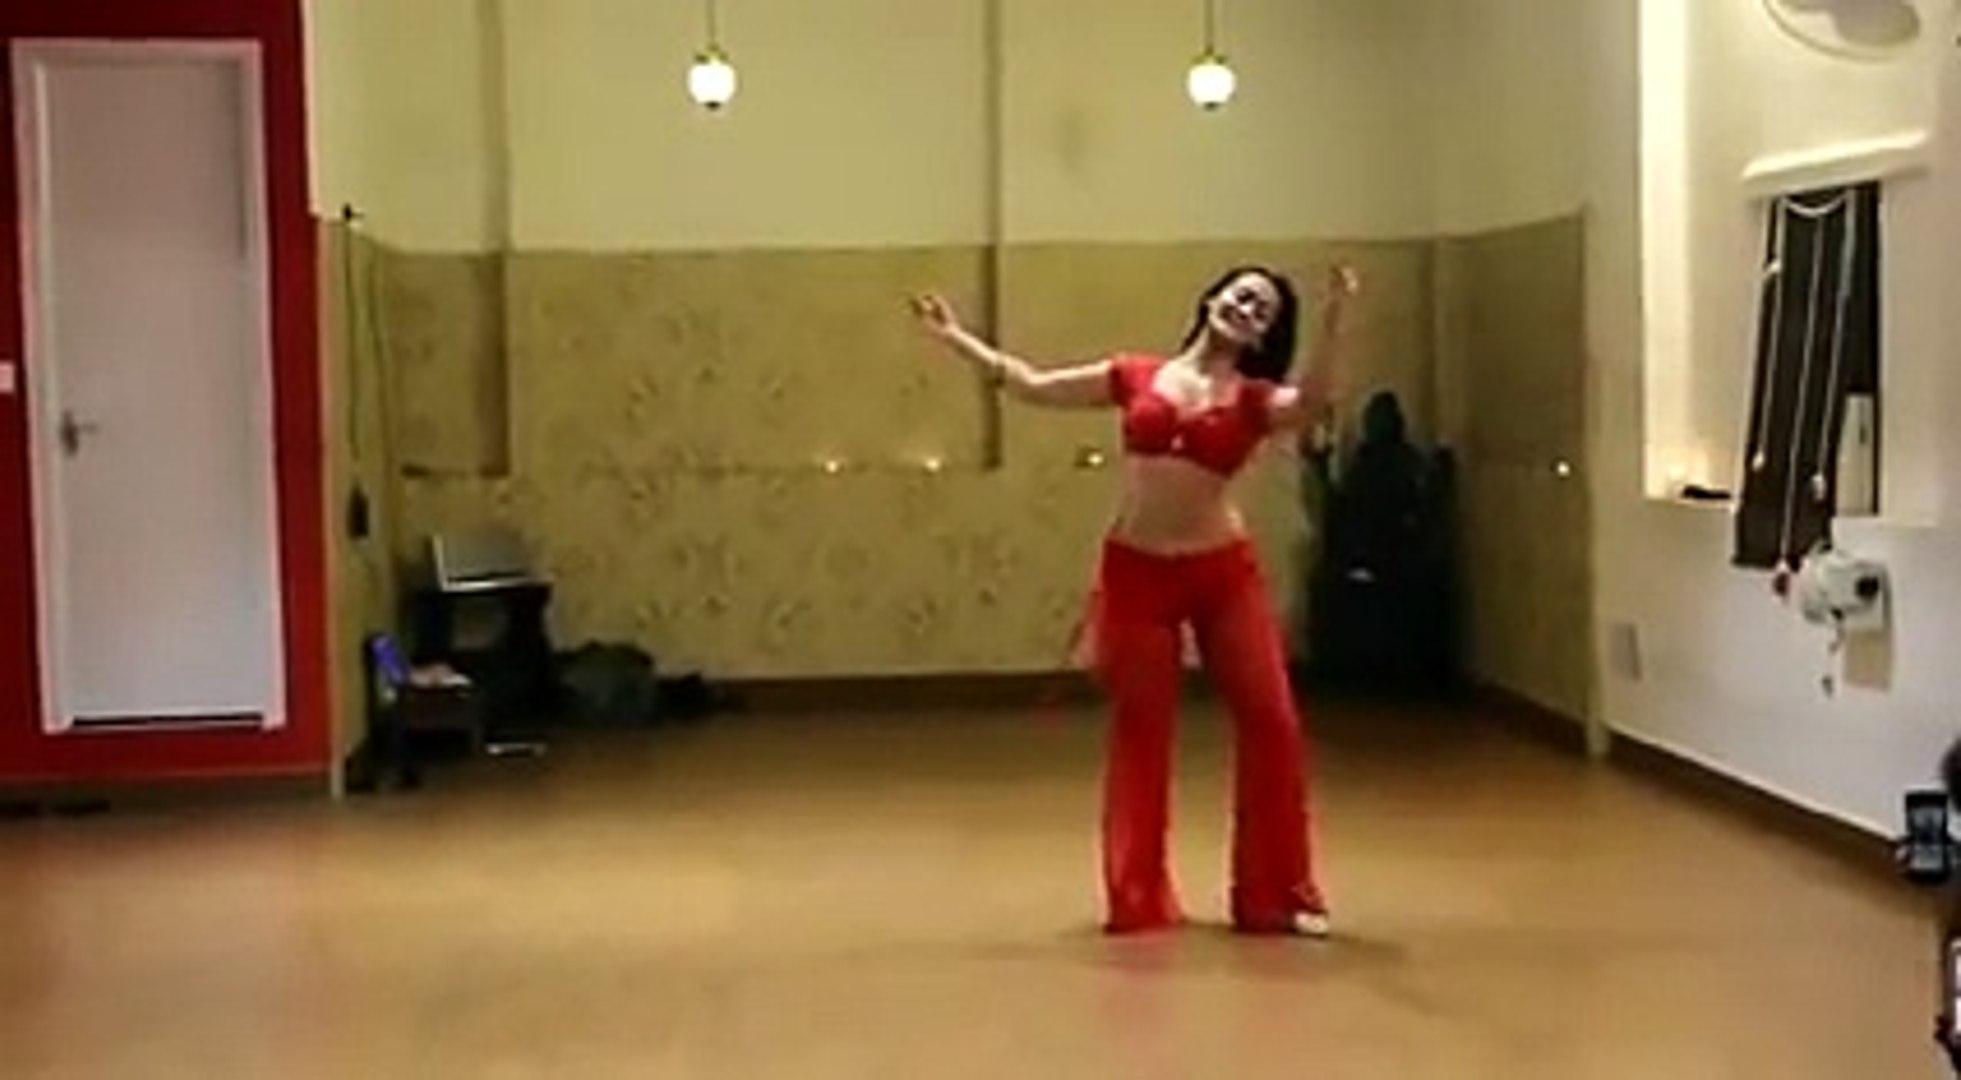 - Sexy Leaked Video PAKISTANI MUJRA DANCE Mujra Videos 2017 Latest Mujra video upcoming hot punjabi